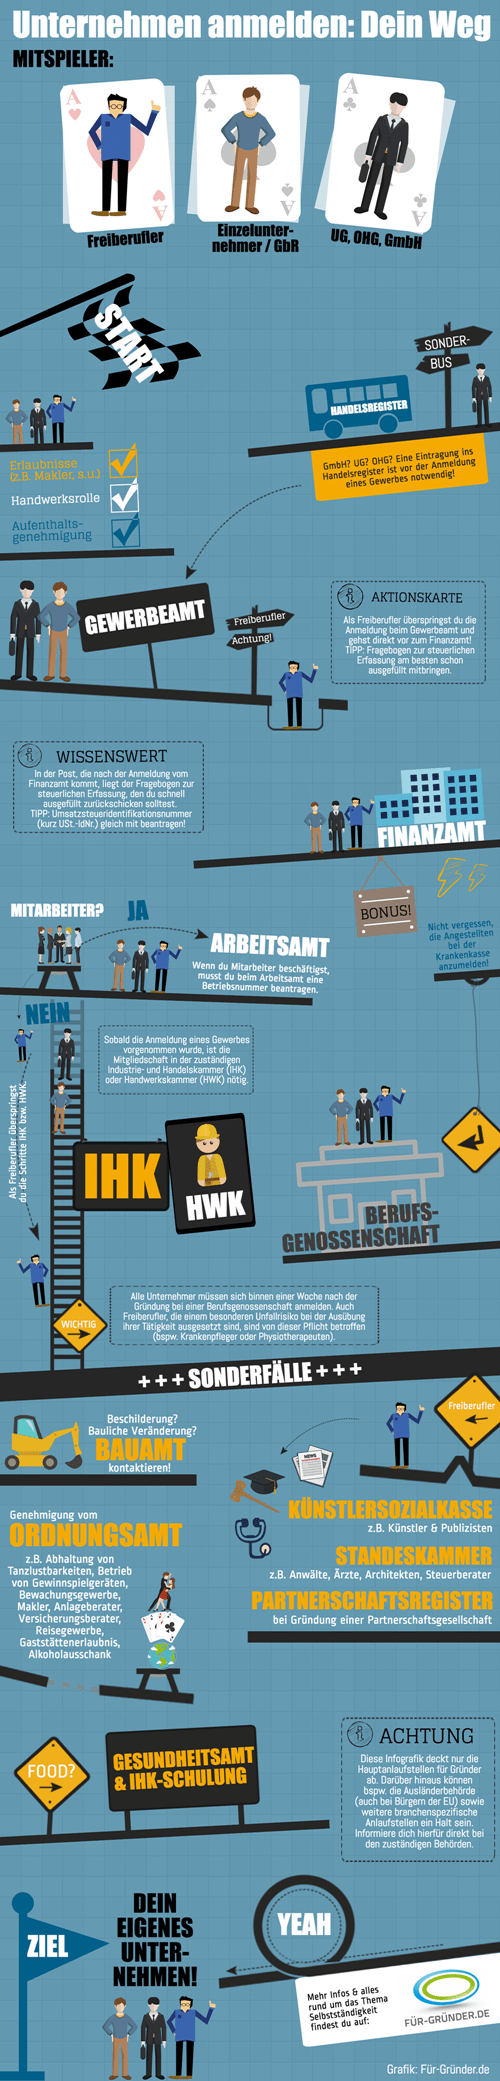 Infografik Nebengewerbe anmelden